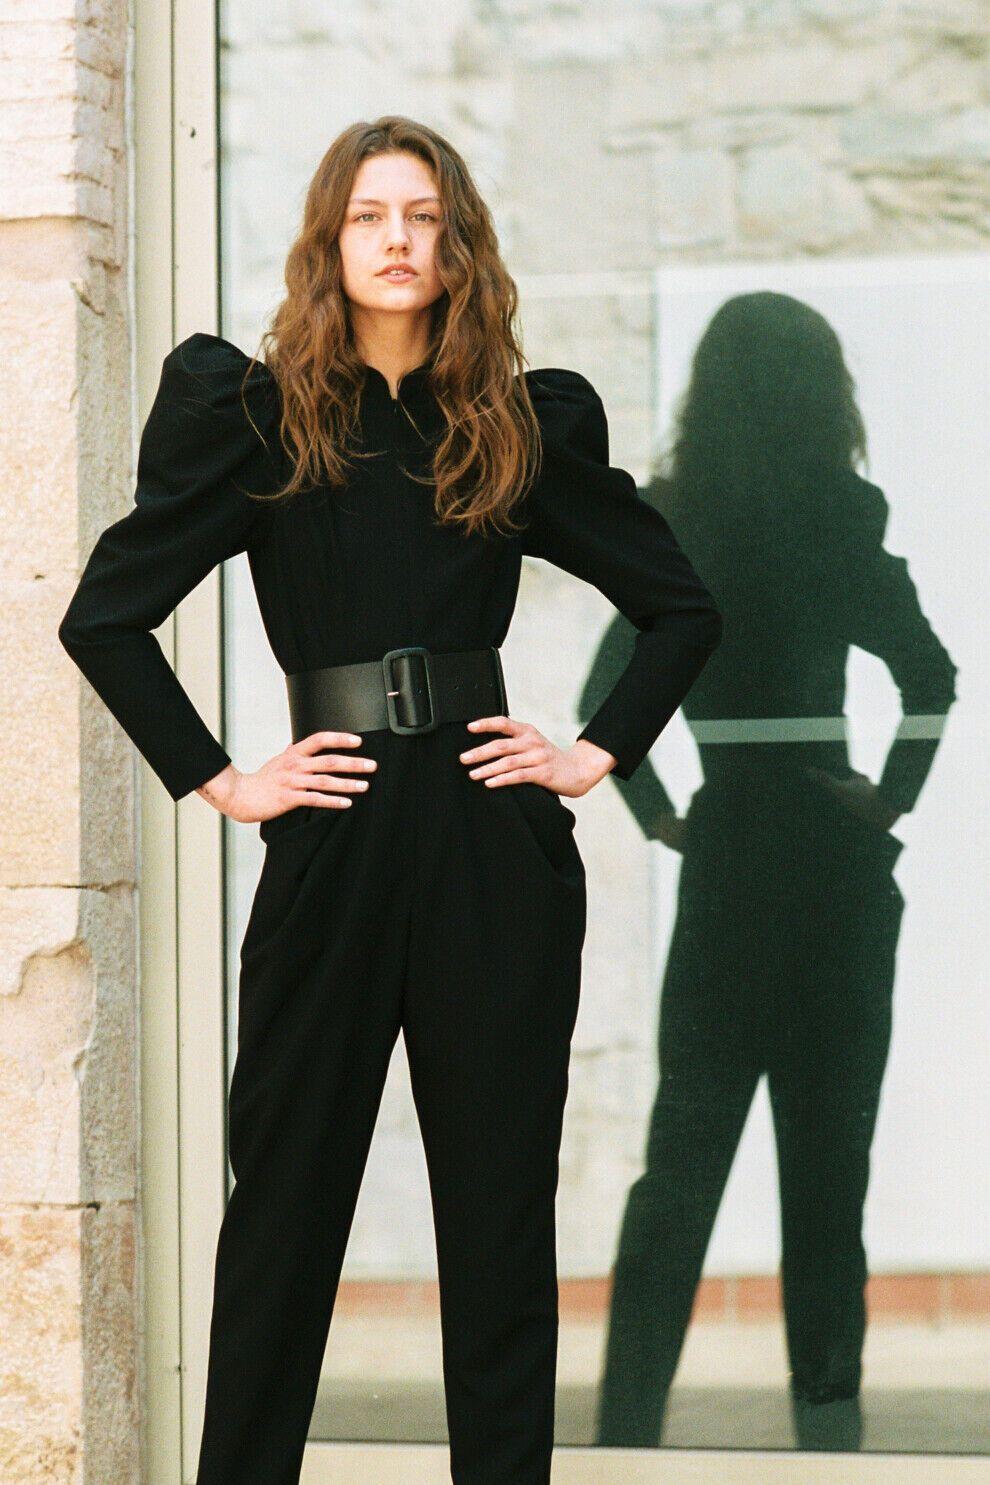 Комбінезон Yanina Couture, ремінь DA'MU та взуття Zannotti